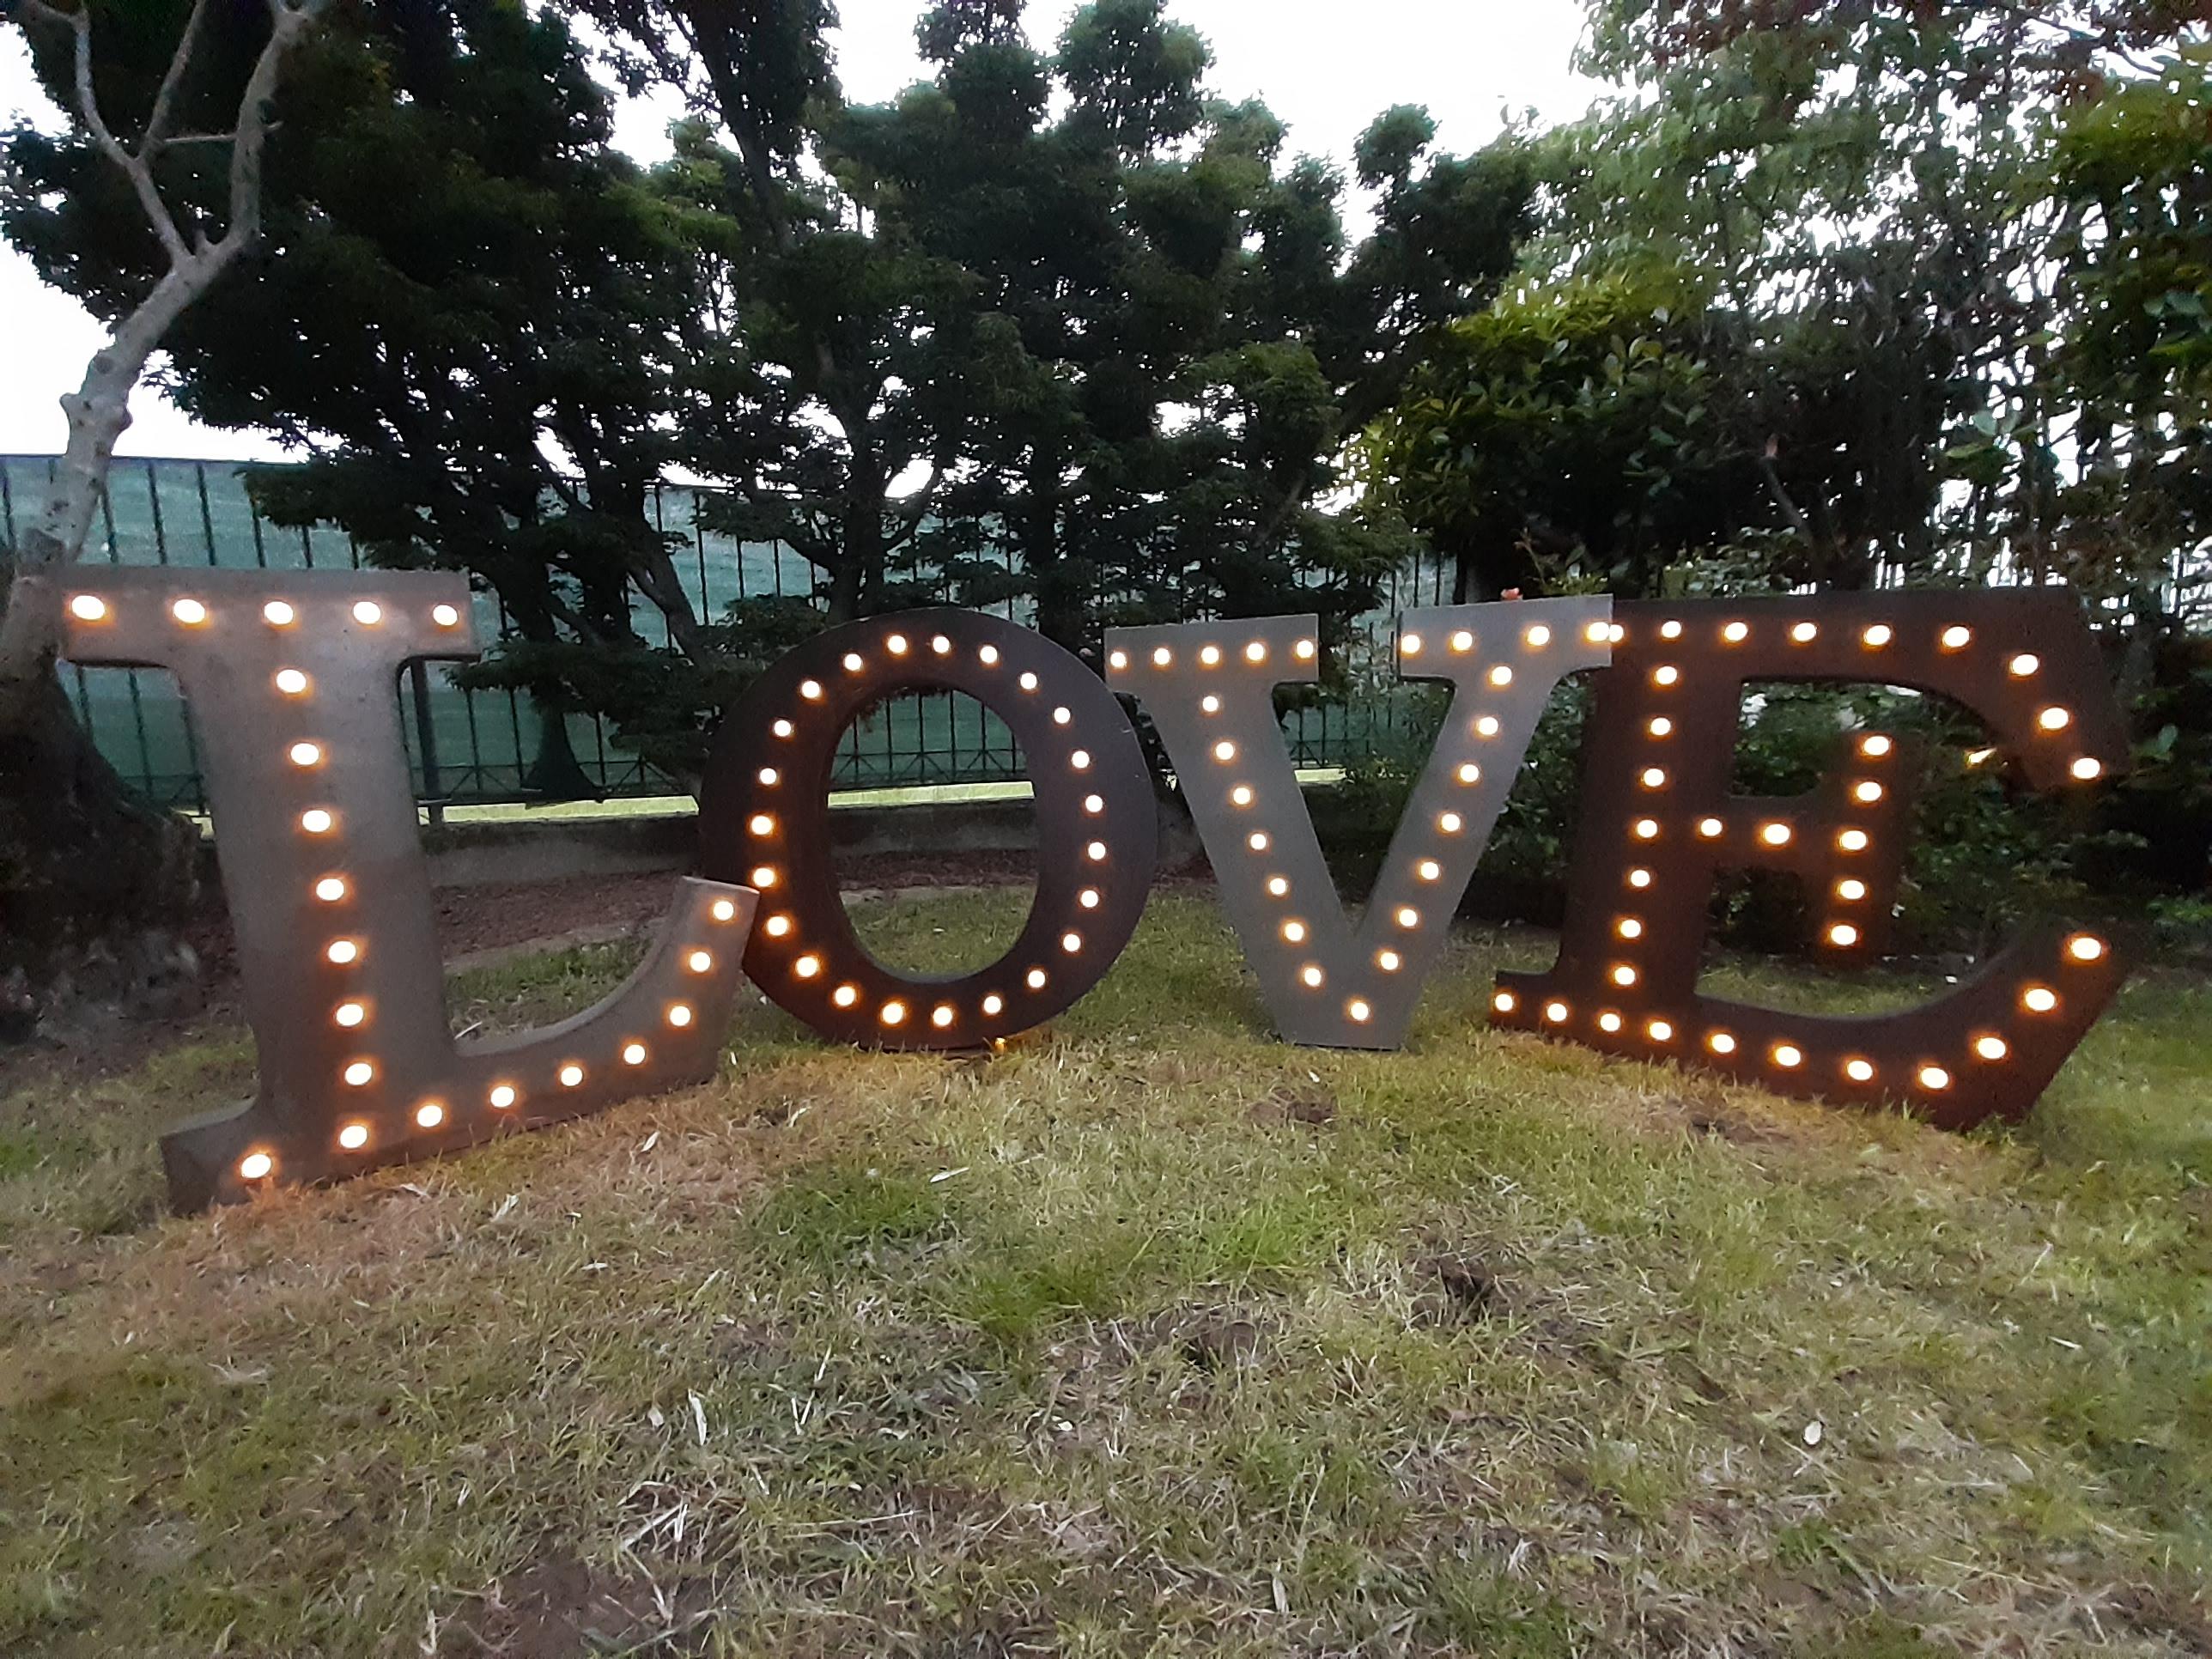 Scritta Luminosa LOVE in stile industriale grande gigante